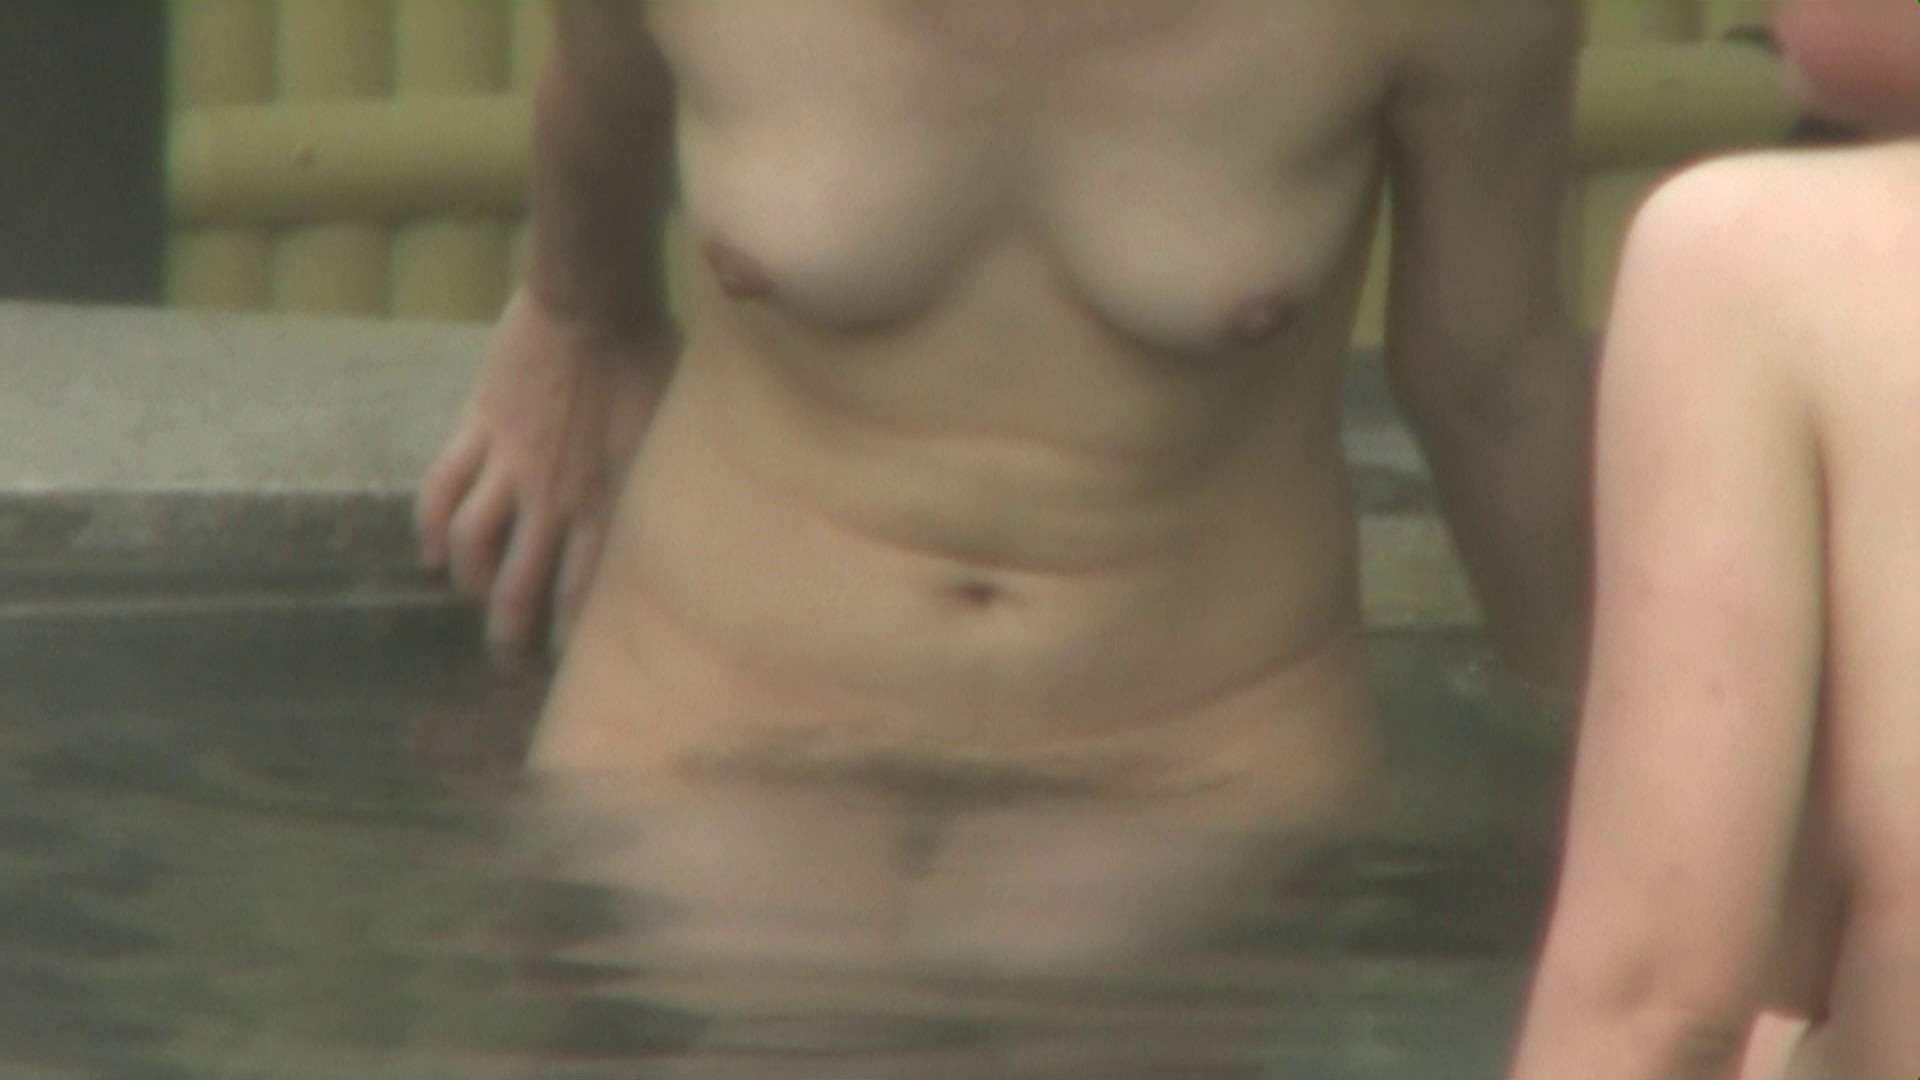 Aquaな露天風呂Vol.74【VIP限定】 綺麗なOLたち われめAV動画紹介 79枚 56